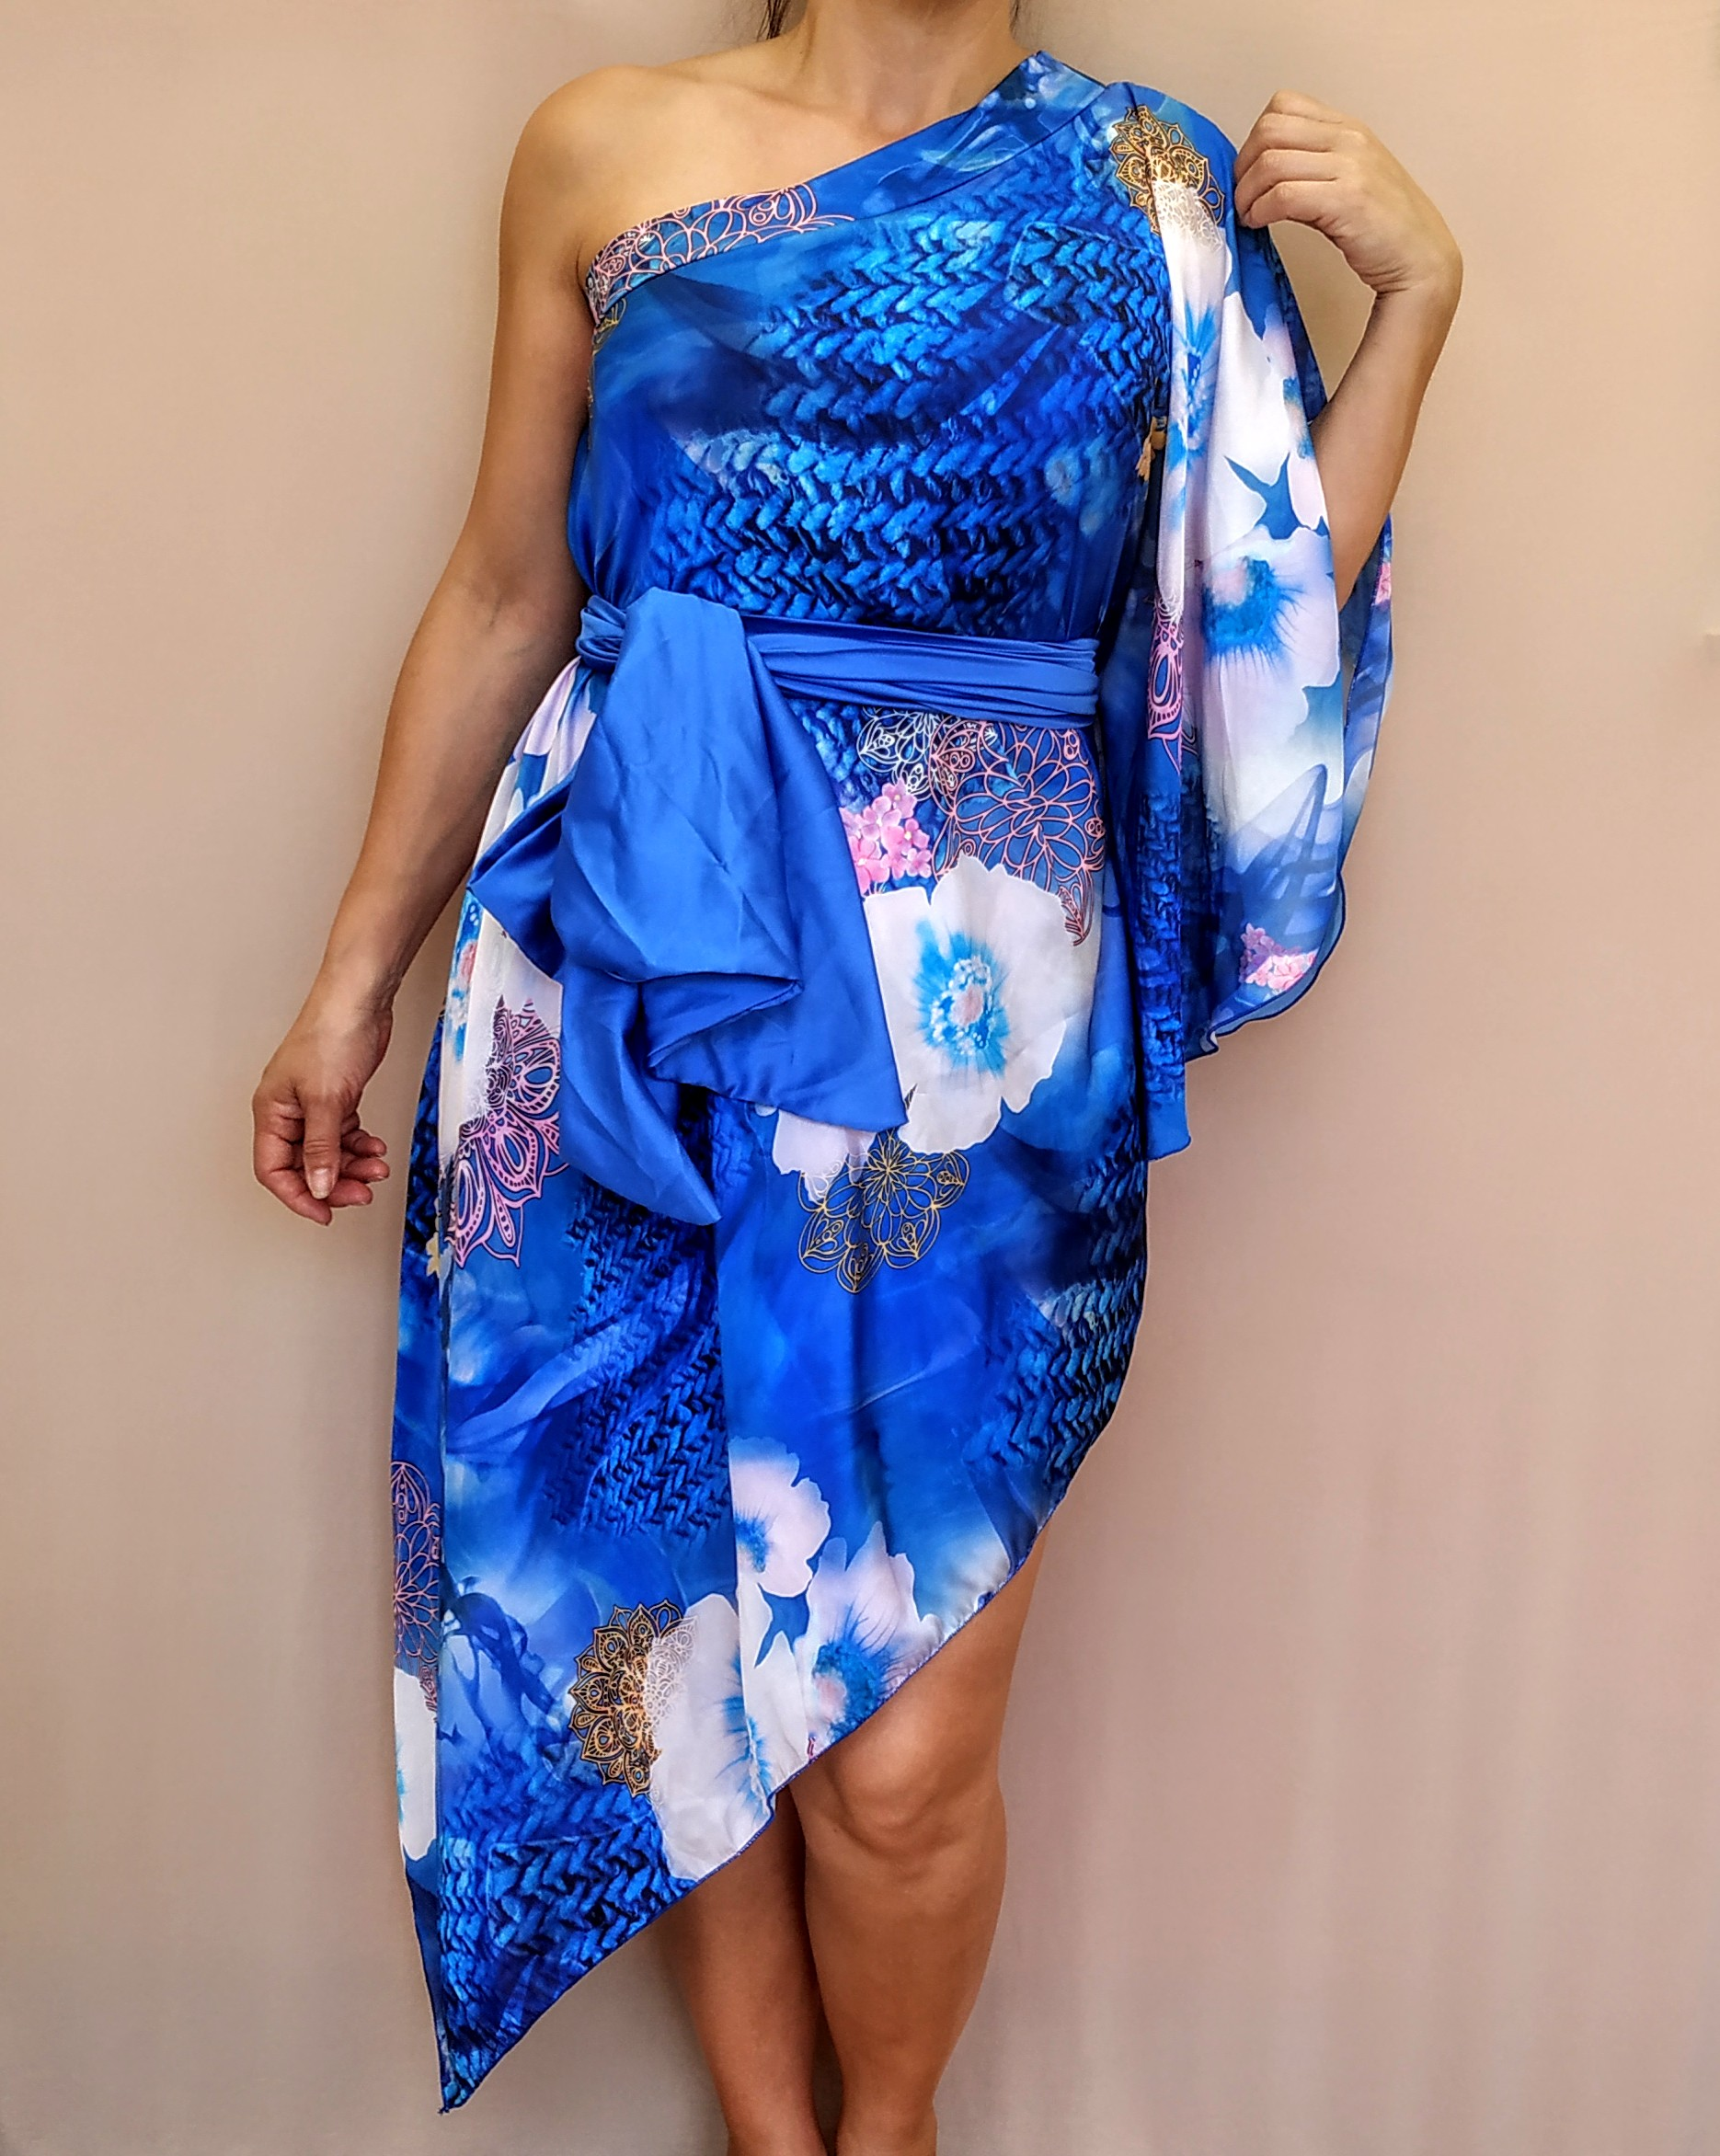 miuma-karina-azul-largo-moda-vestido-cambrils